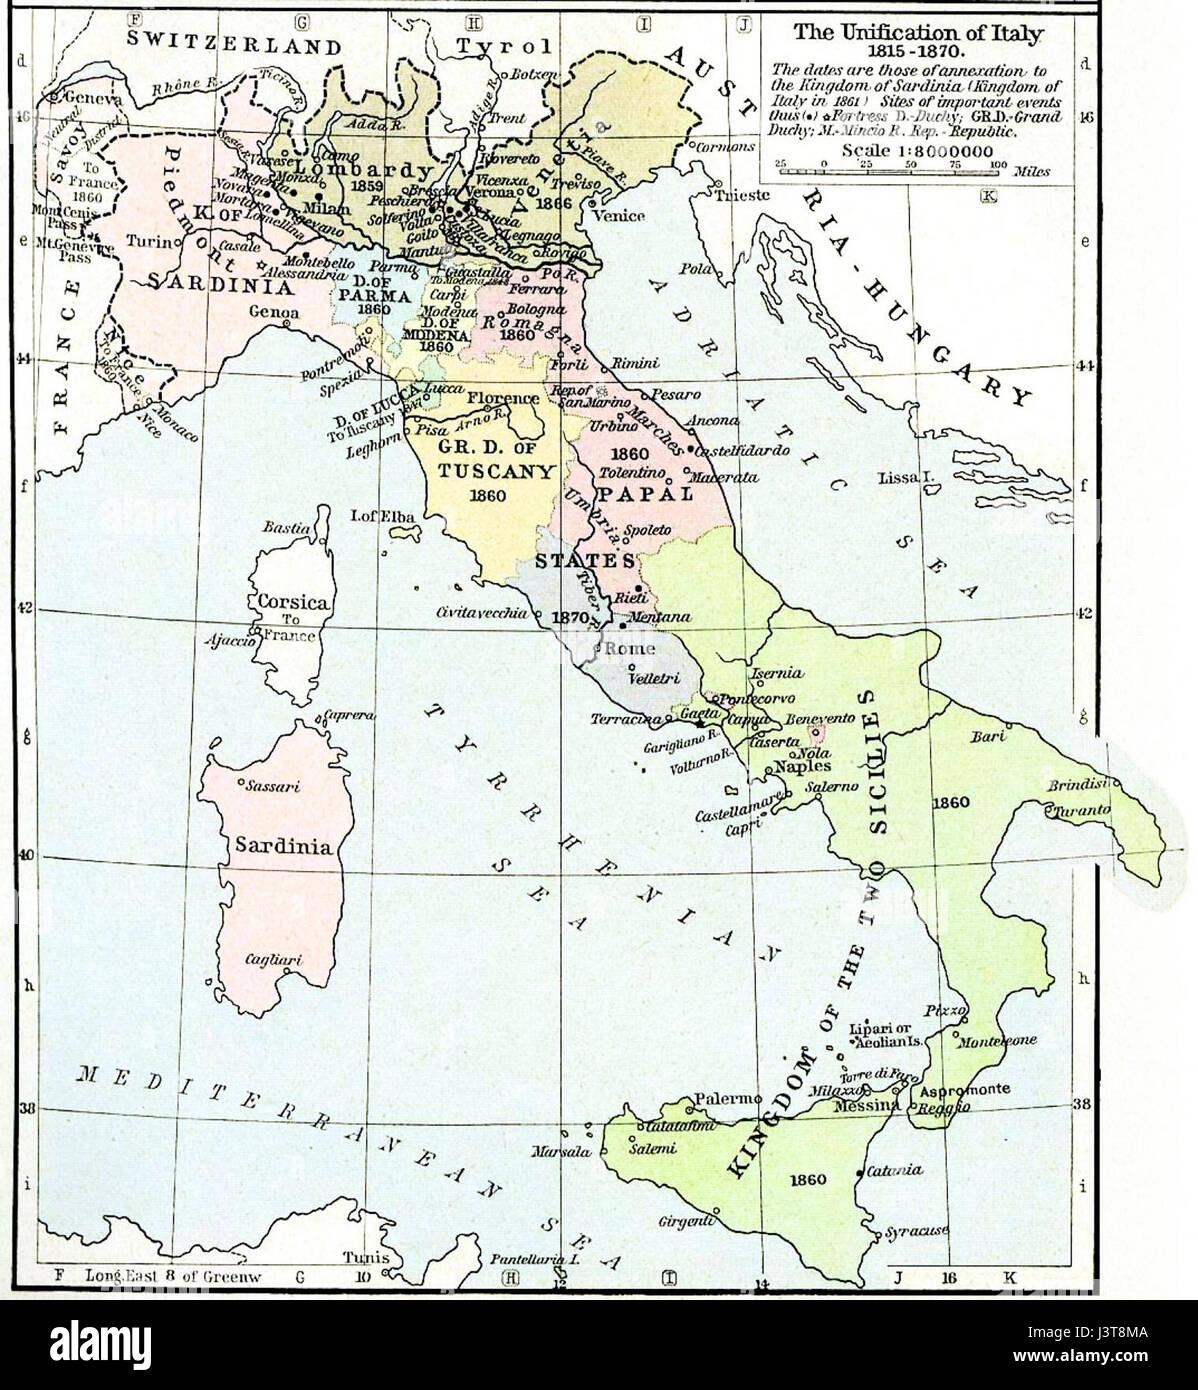 Rieti Italy Map.Italy 1815 Map Stock Photos Italy 1815 Map Stock Images Alamy